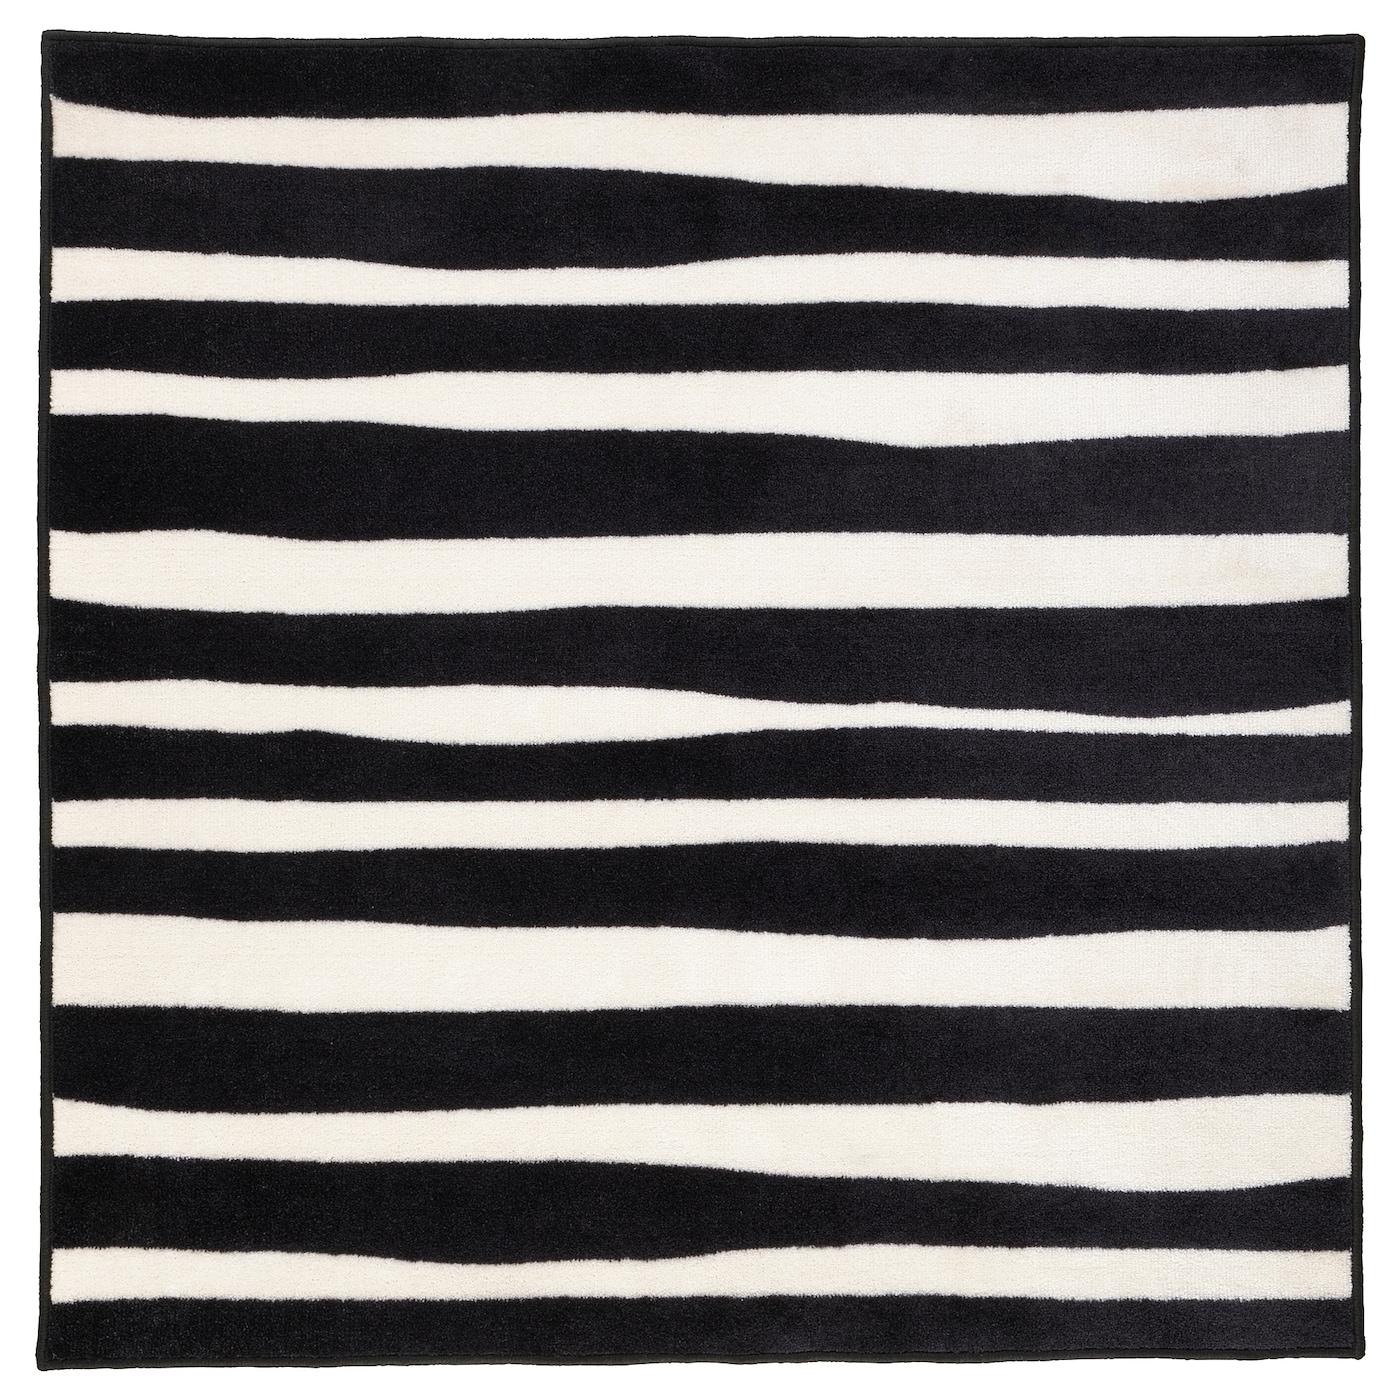 Urskog Rug Low Pile Zebra Striped Ikea